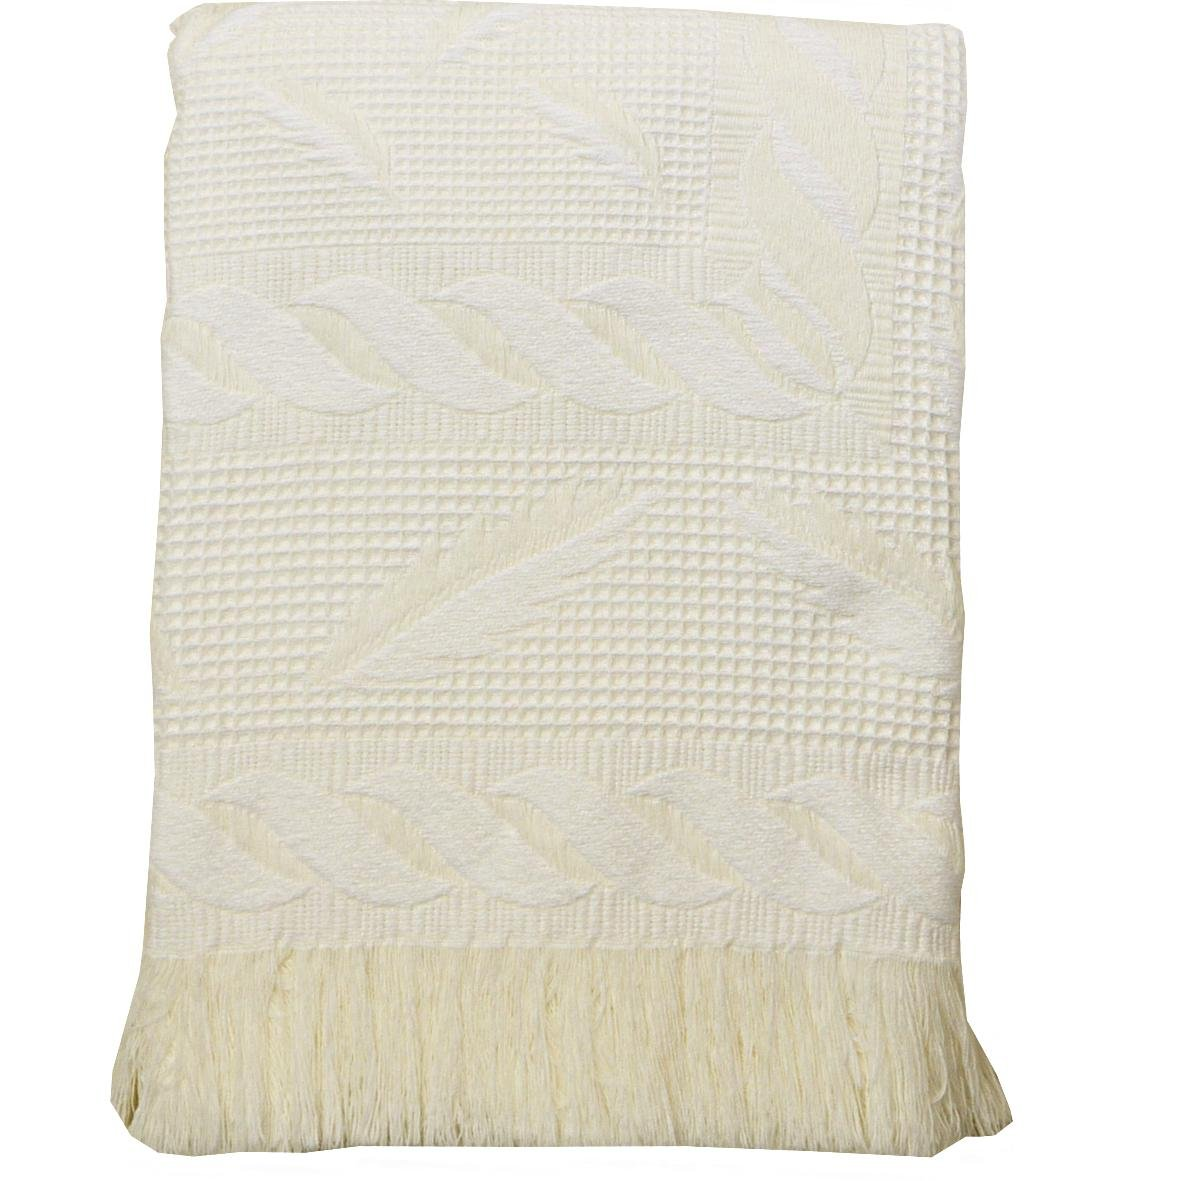 BabyPrem Baby Large Soft Acrylic Fern Shawl Blanket 122 x 122cm WHITE